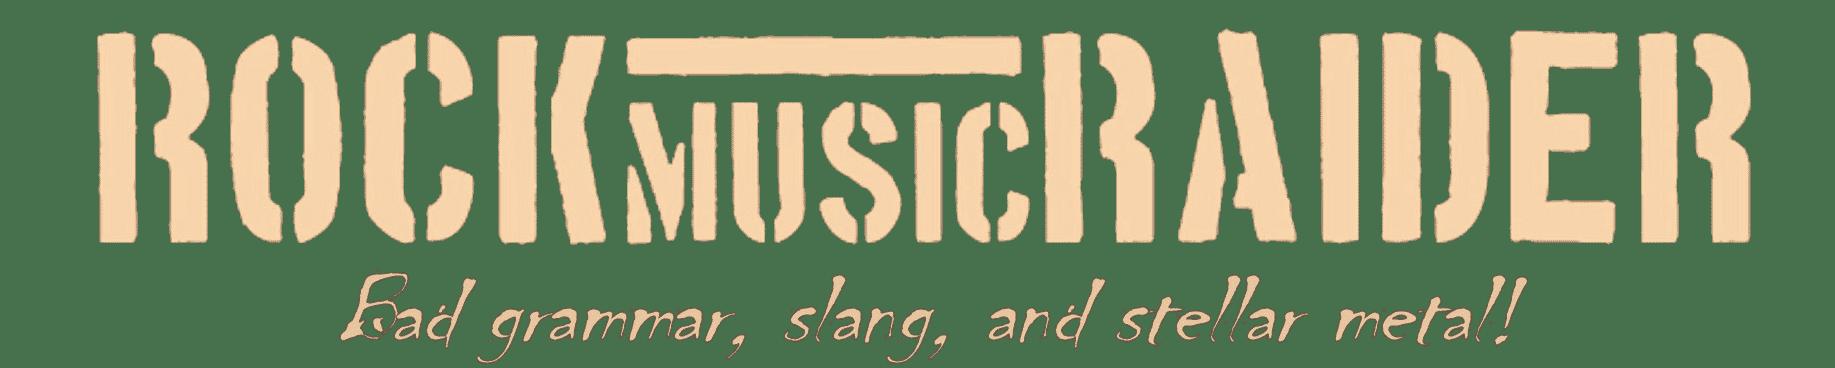 RockmusicRaider